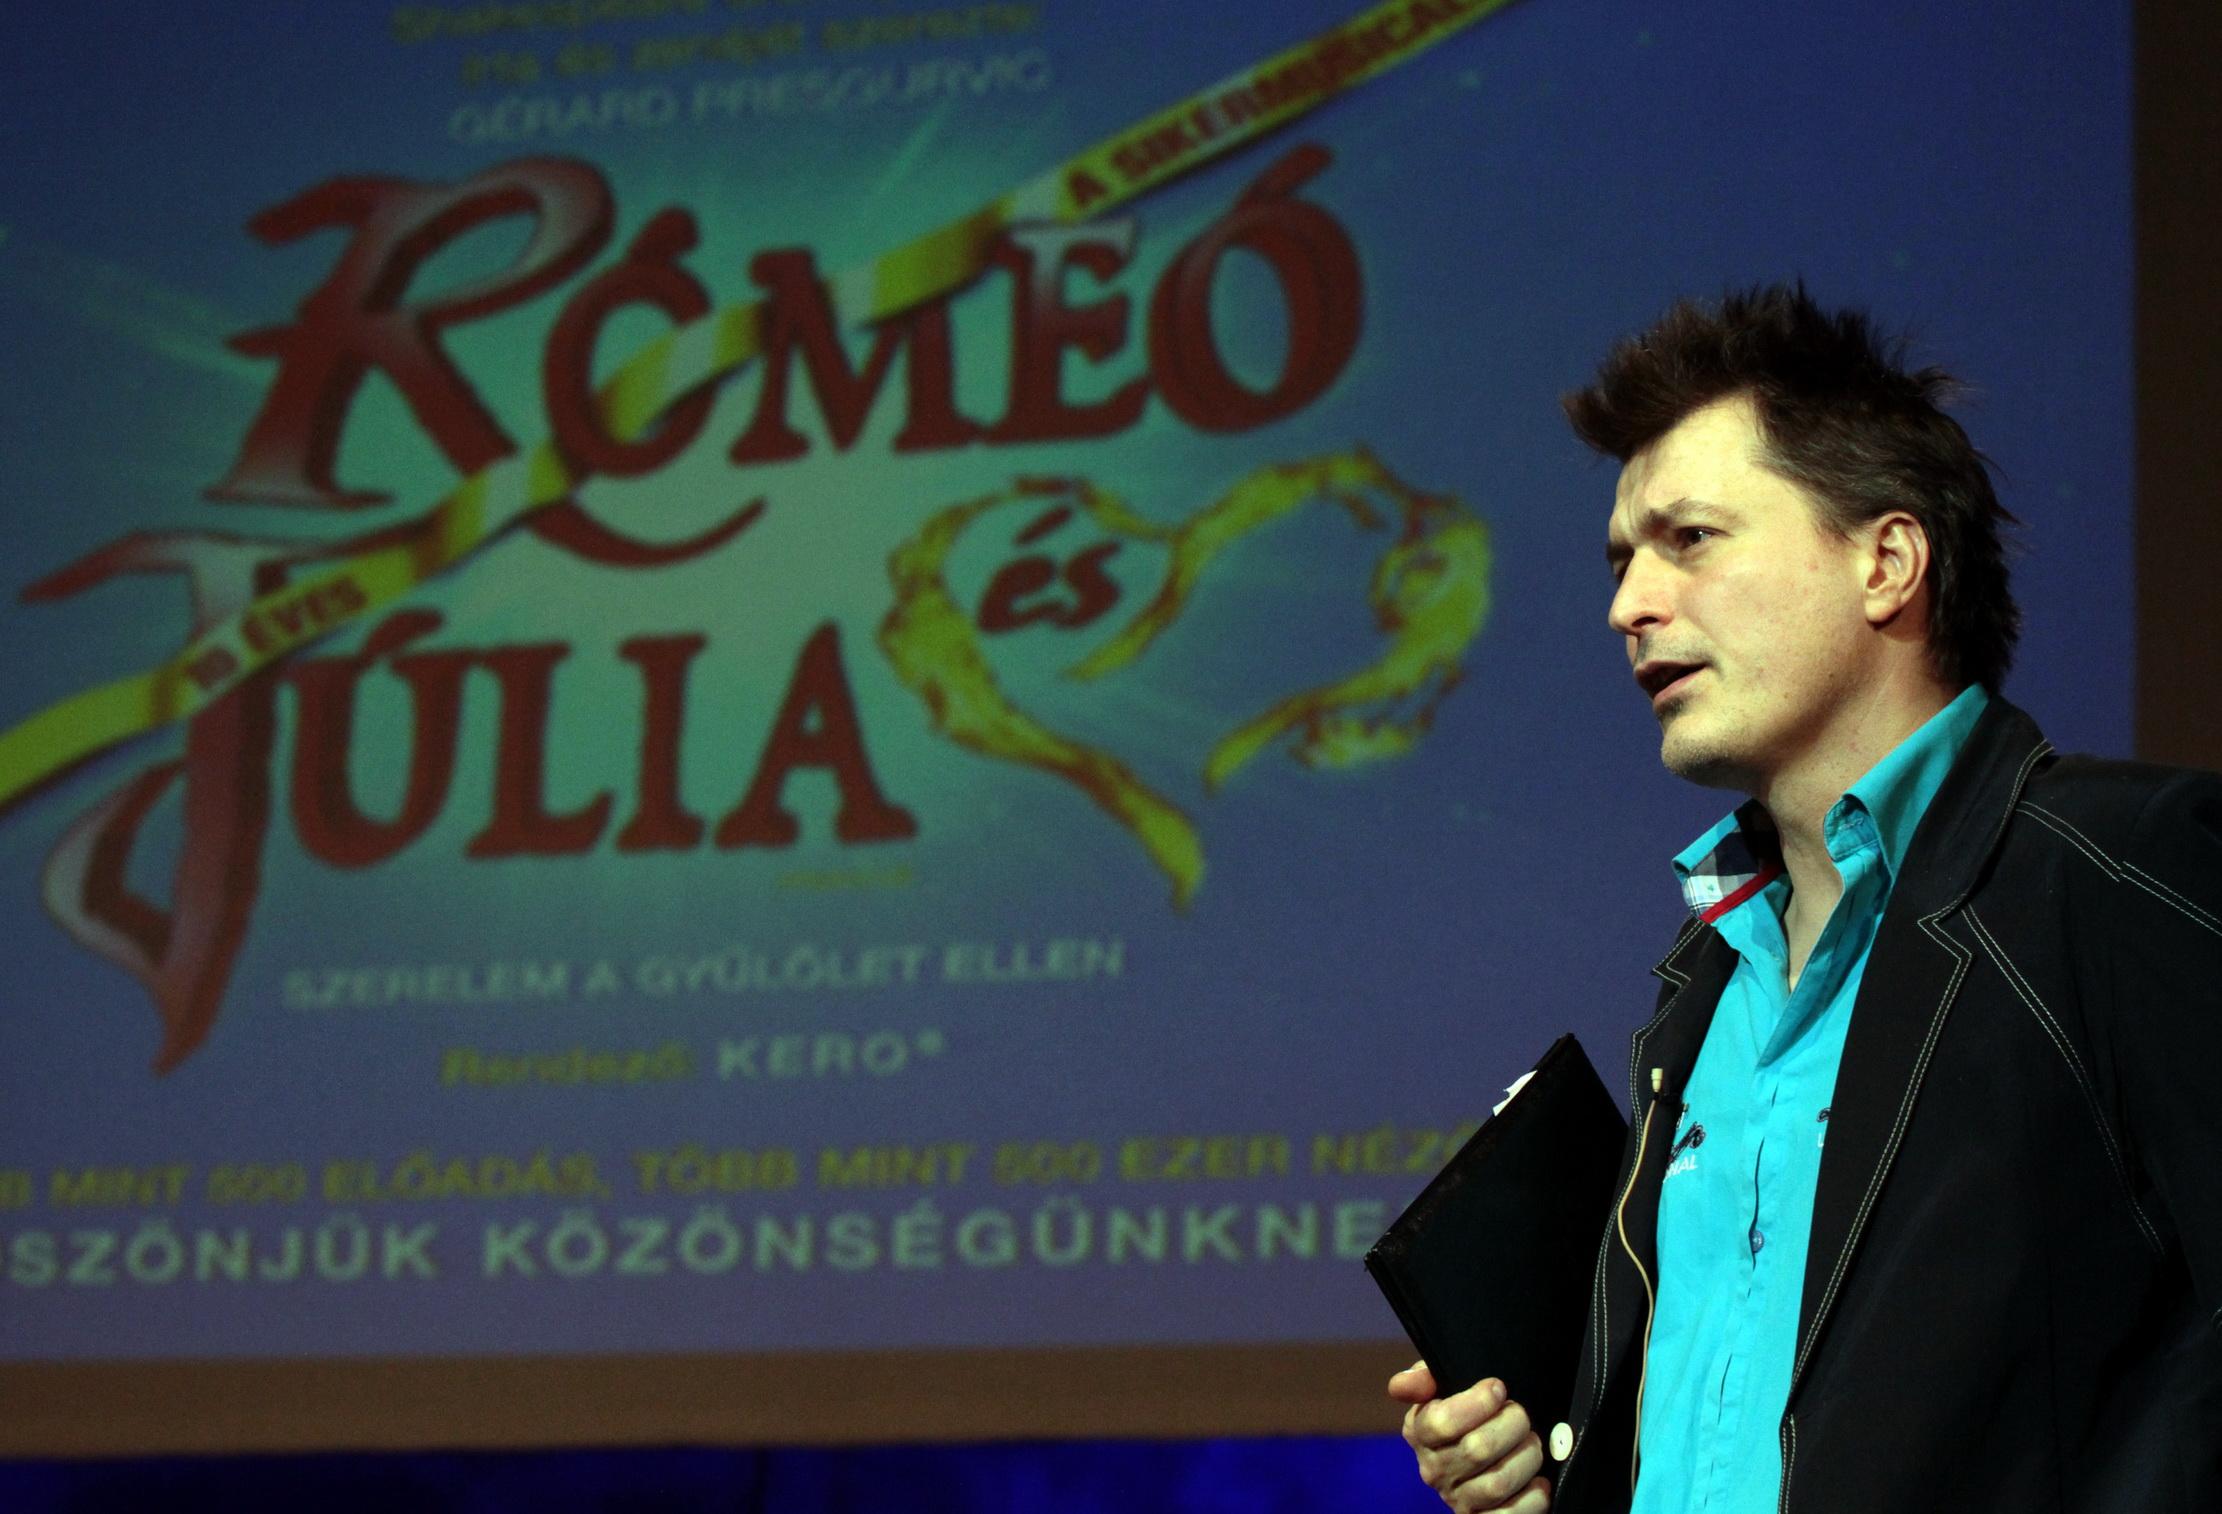 20140115 OPERETT Romeo es Julia 10 eves jubilemi kozonsegtalalkozo 33 resize